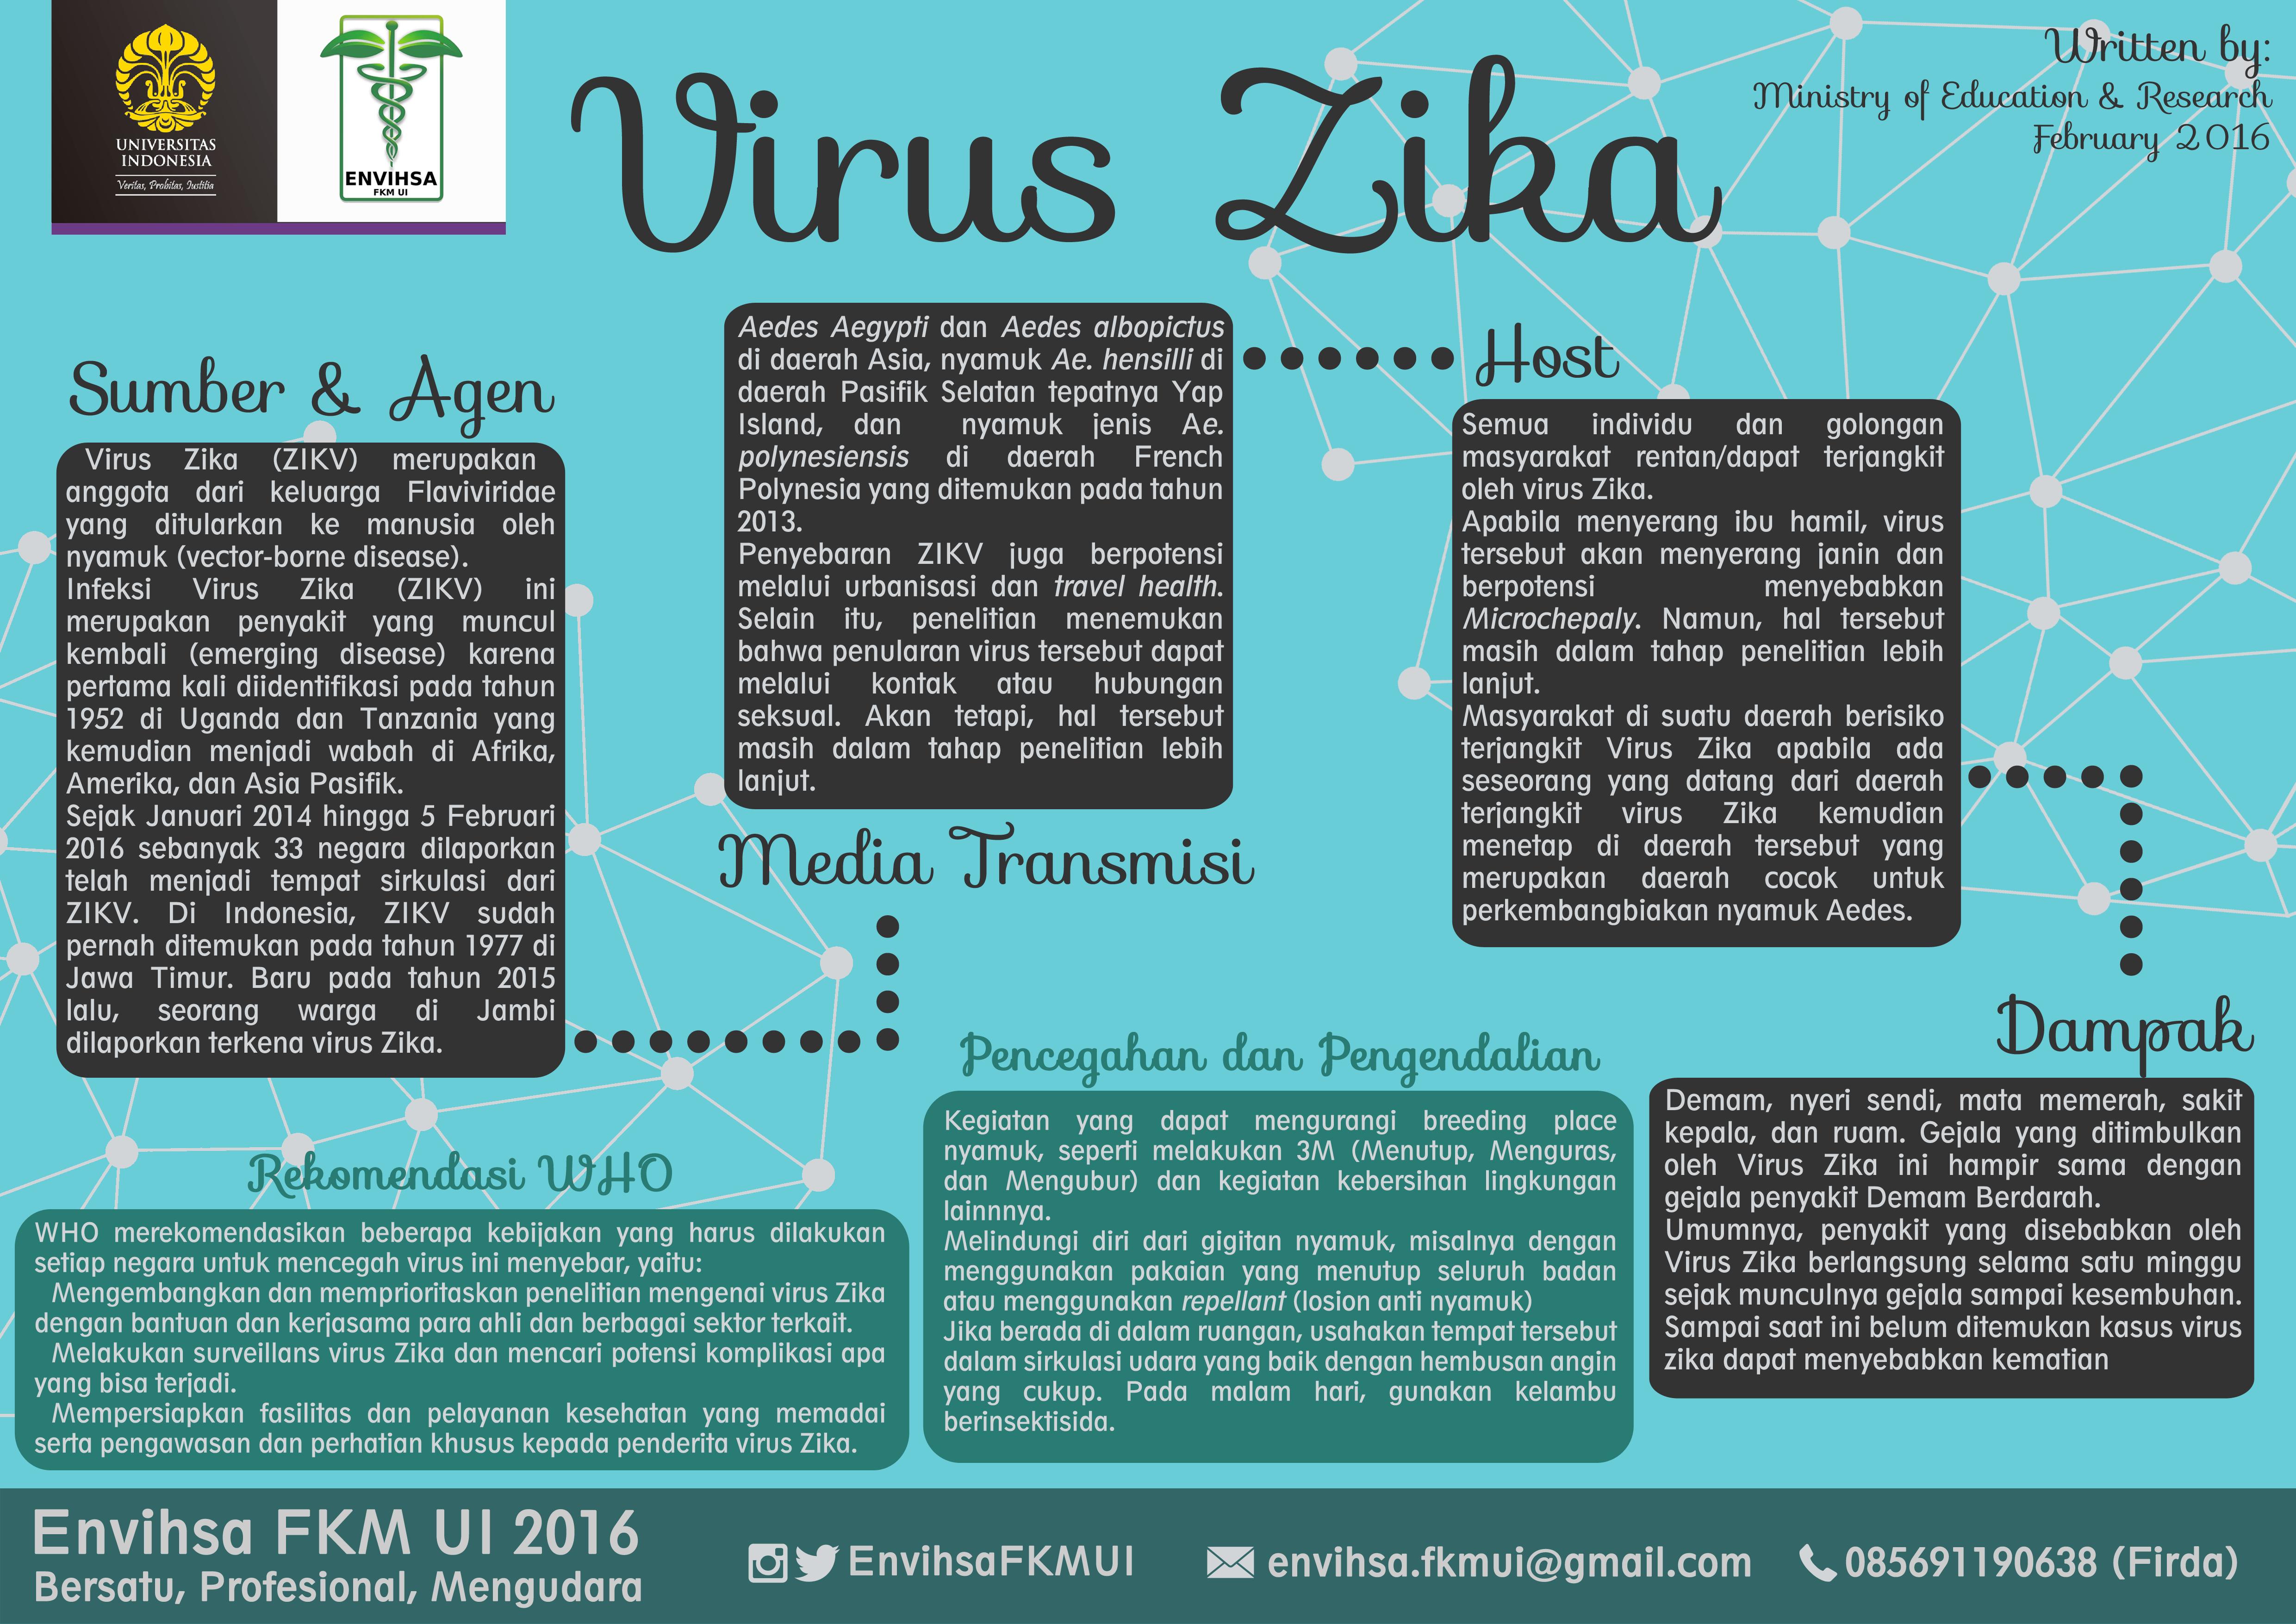 PUBLIC HEALTH SCIENCE SUMMIT : ENVIHSA